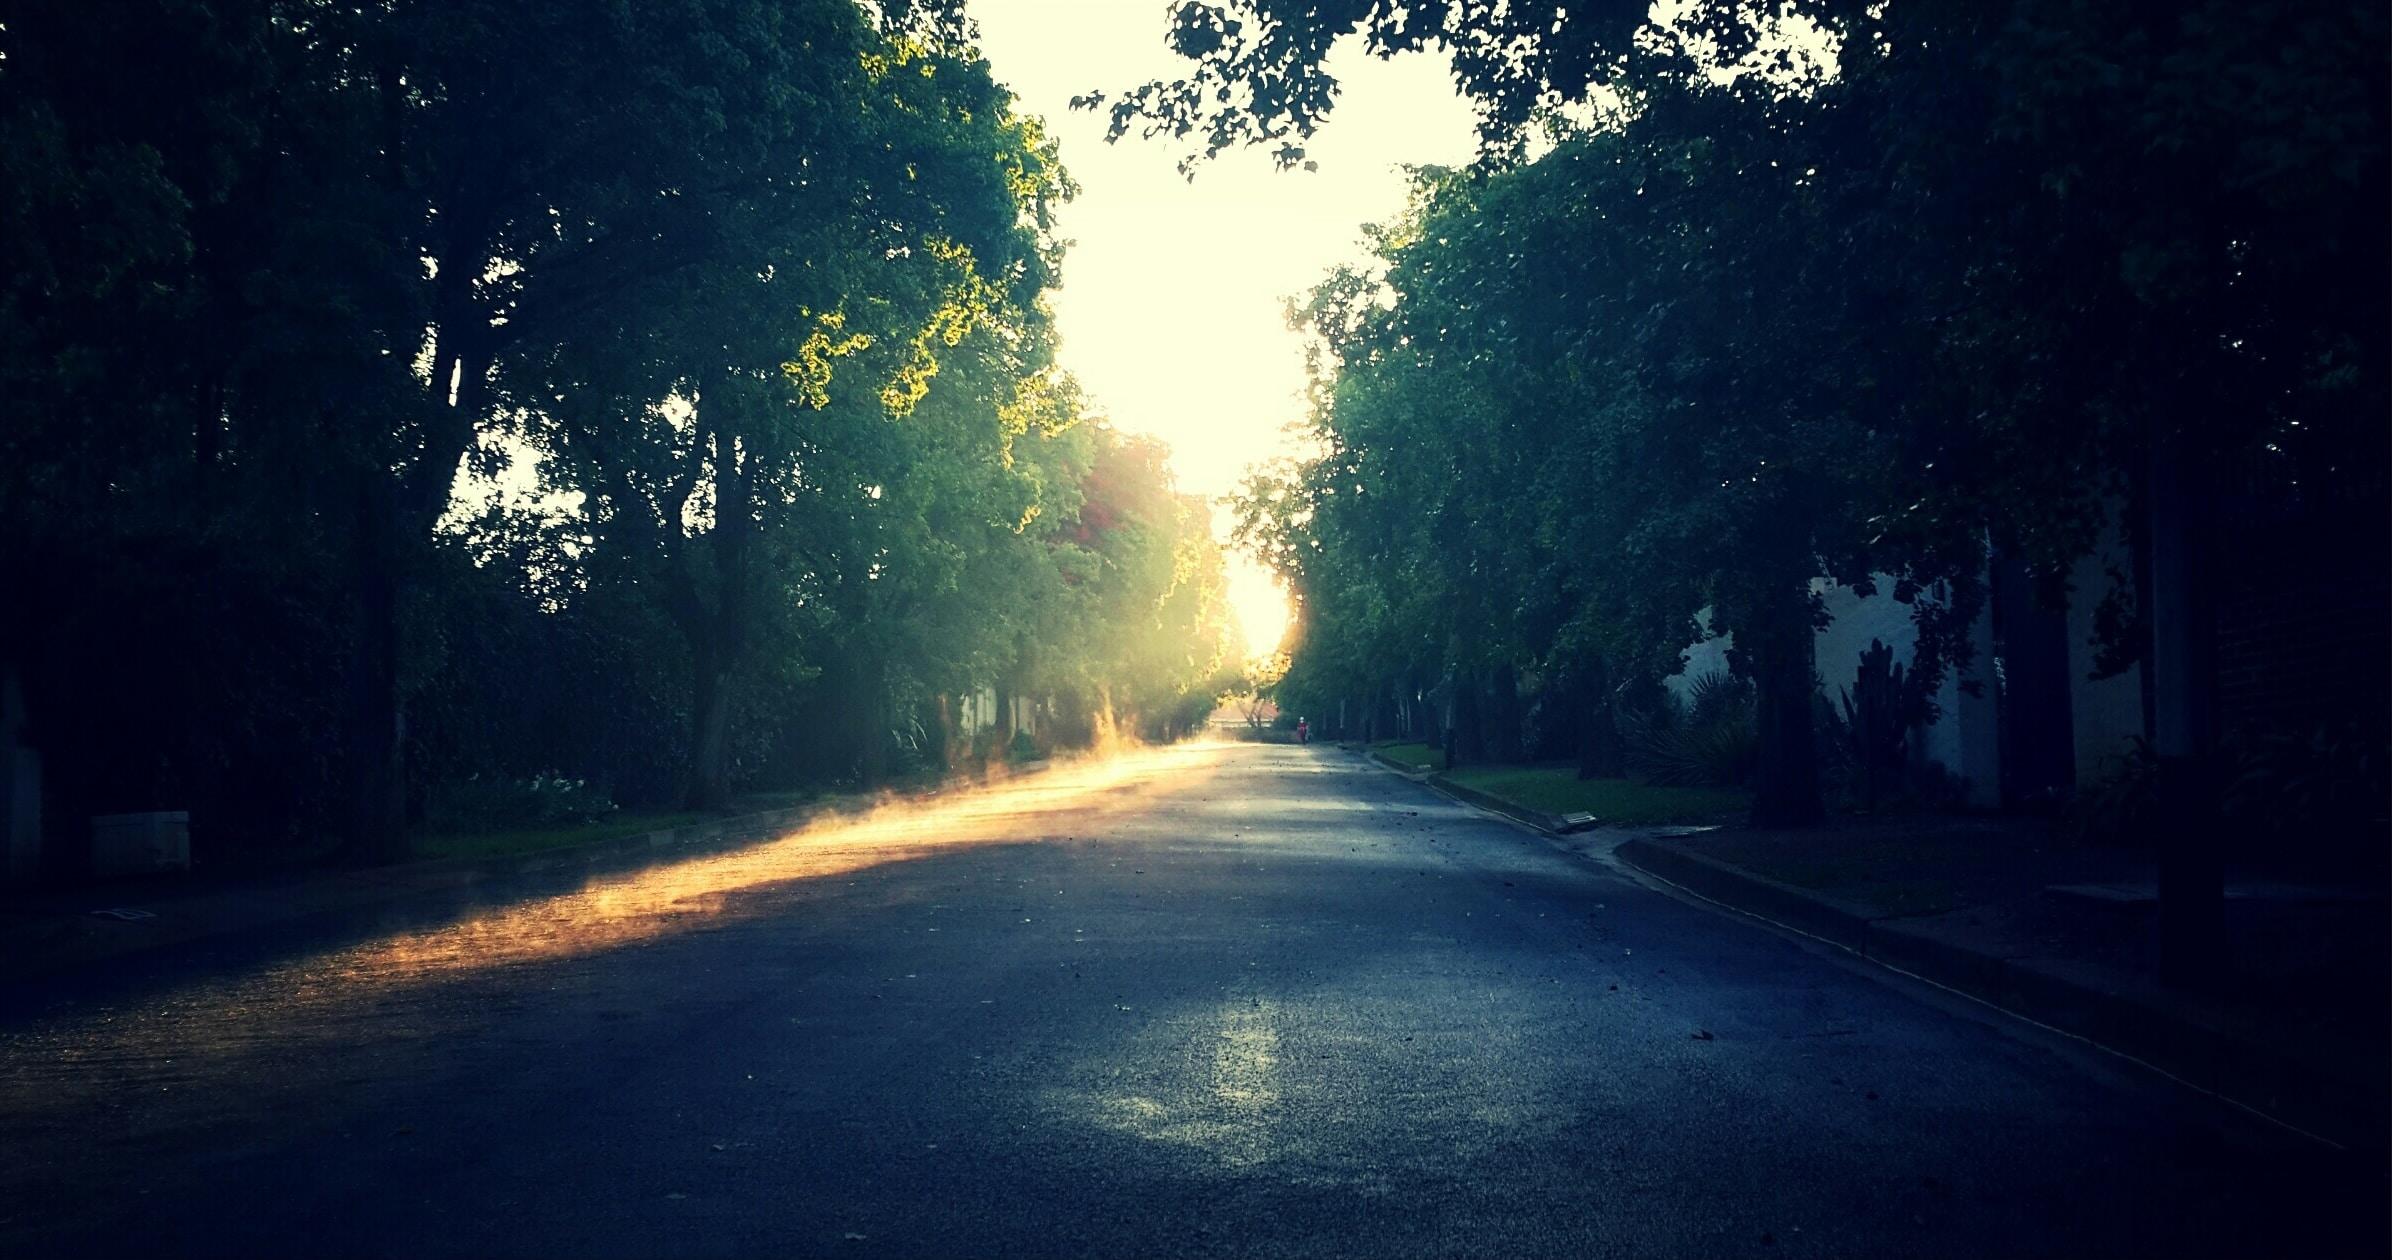 low-light photo of gray pavement